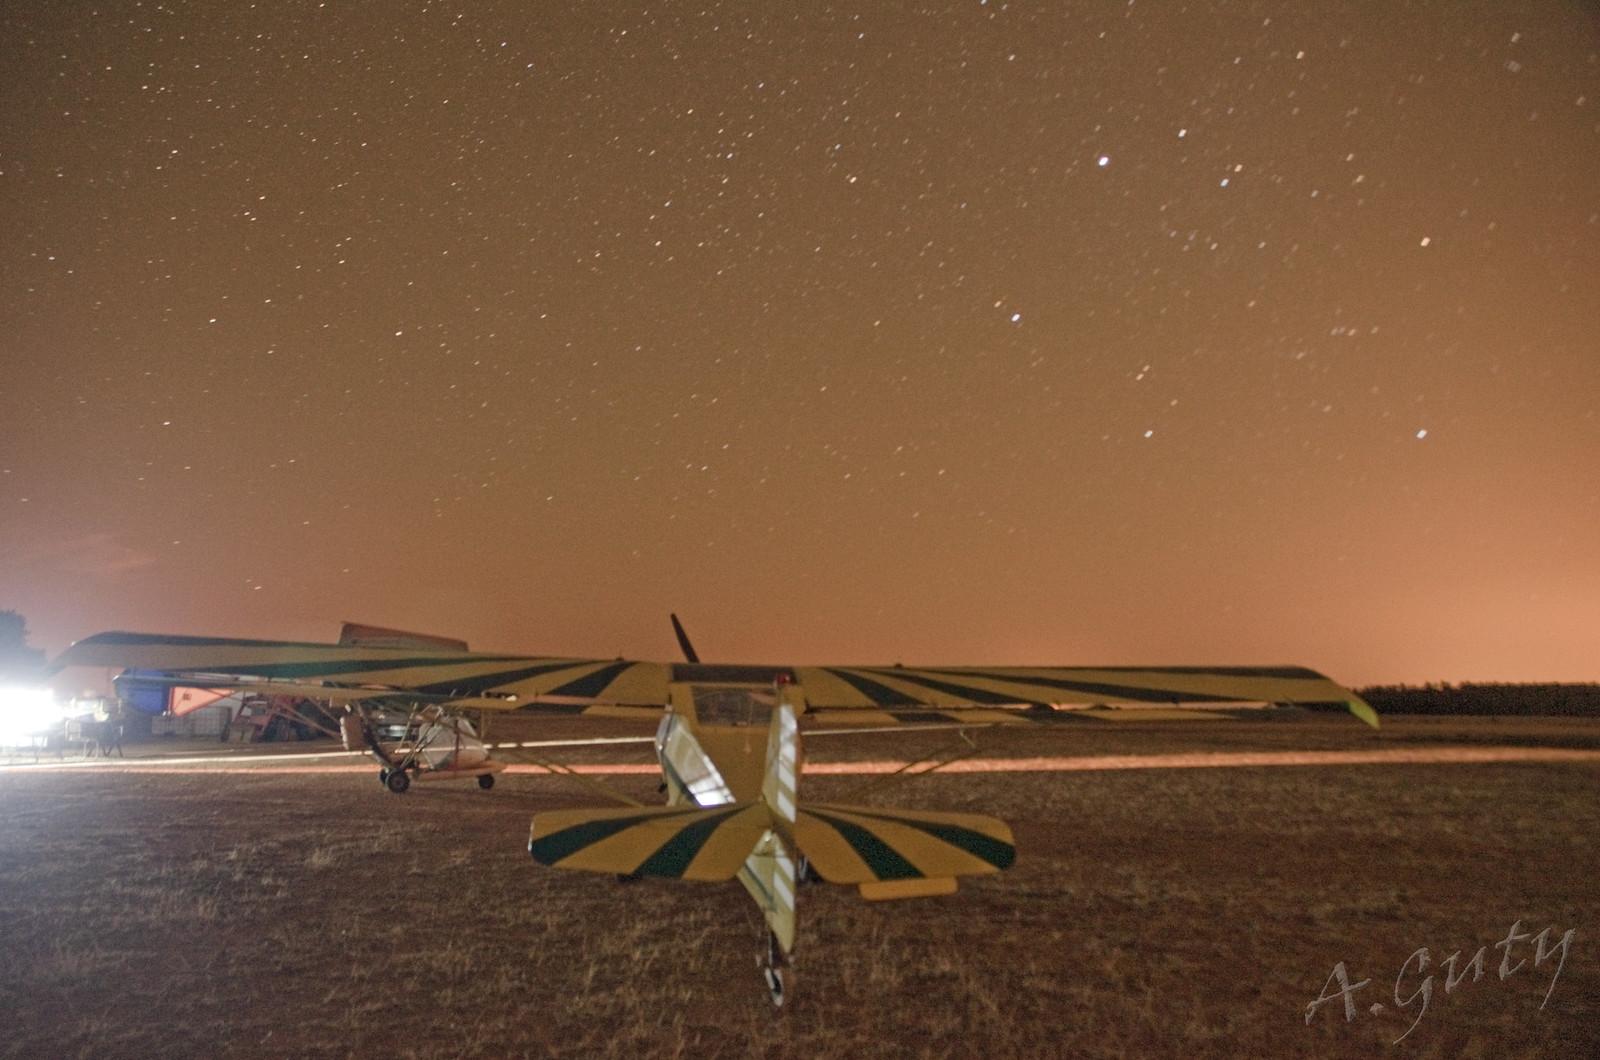 Cena Club Aerodromo Astorga Kitfox  hangar noche (2)